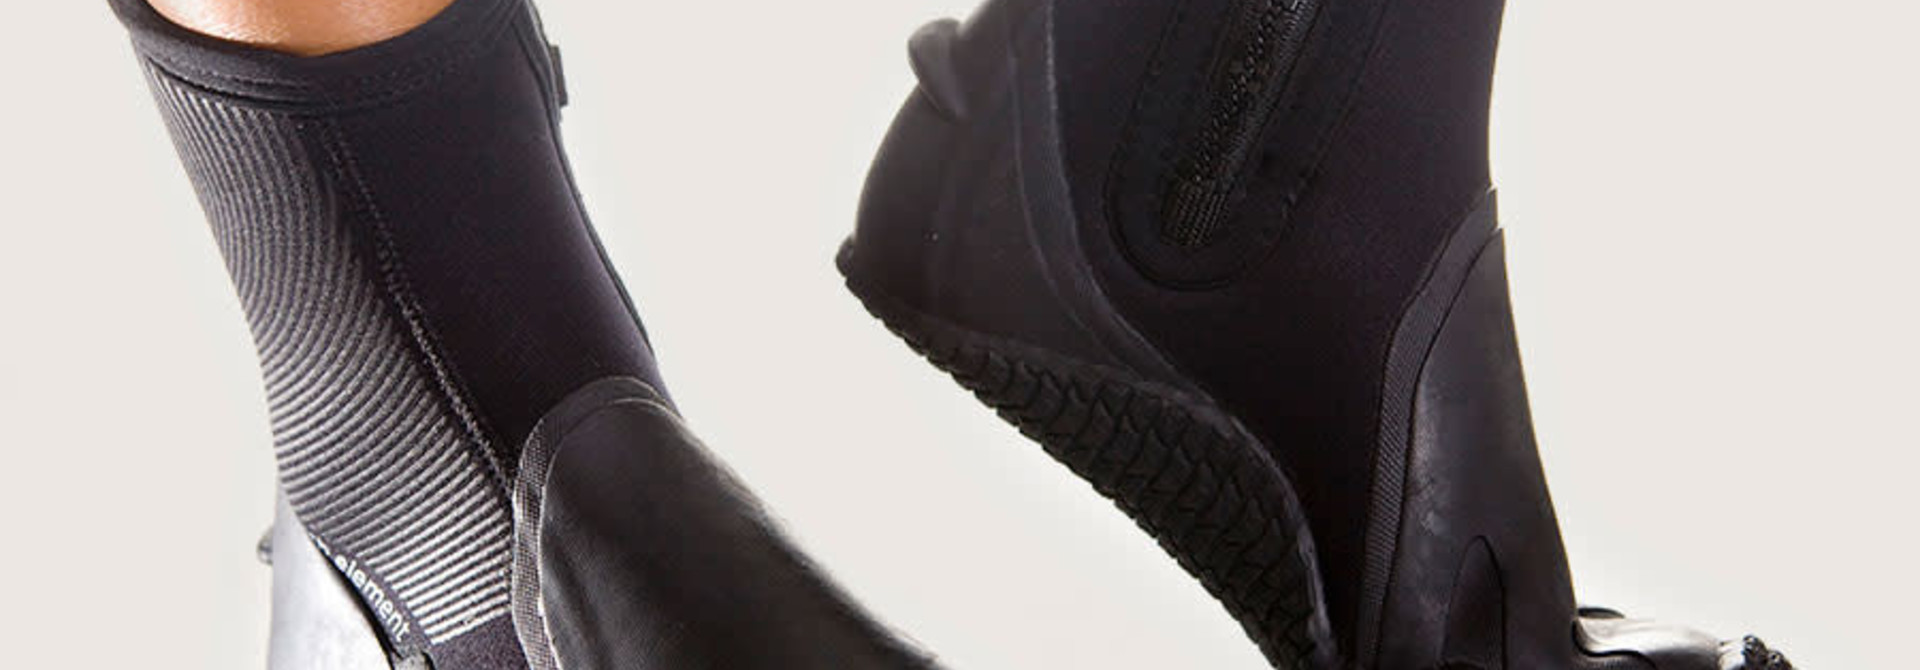 Pelagic 6,5mm Boot - Rubberen zool